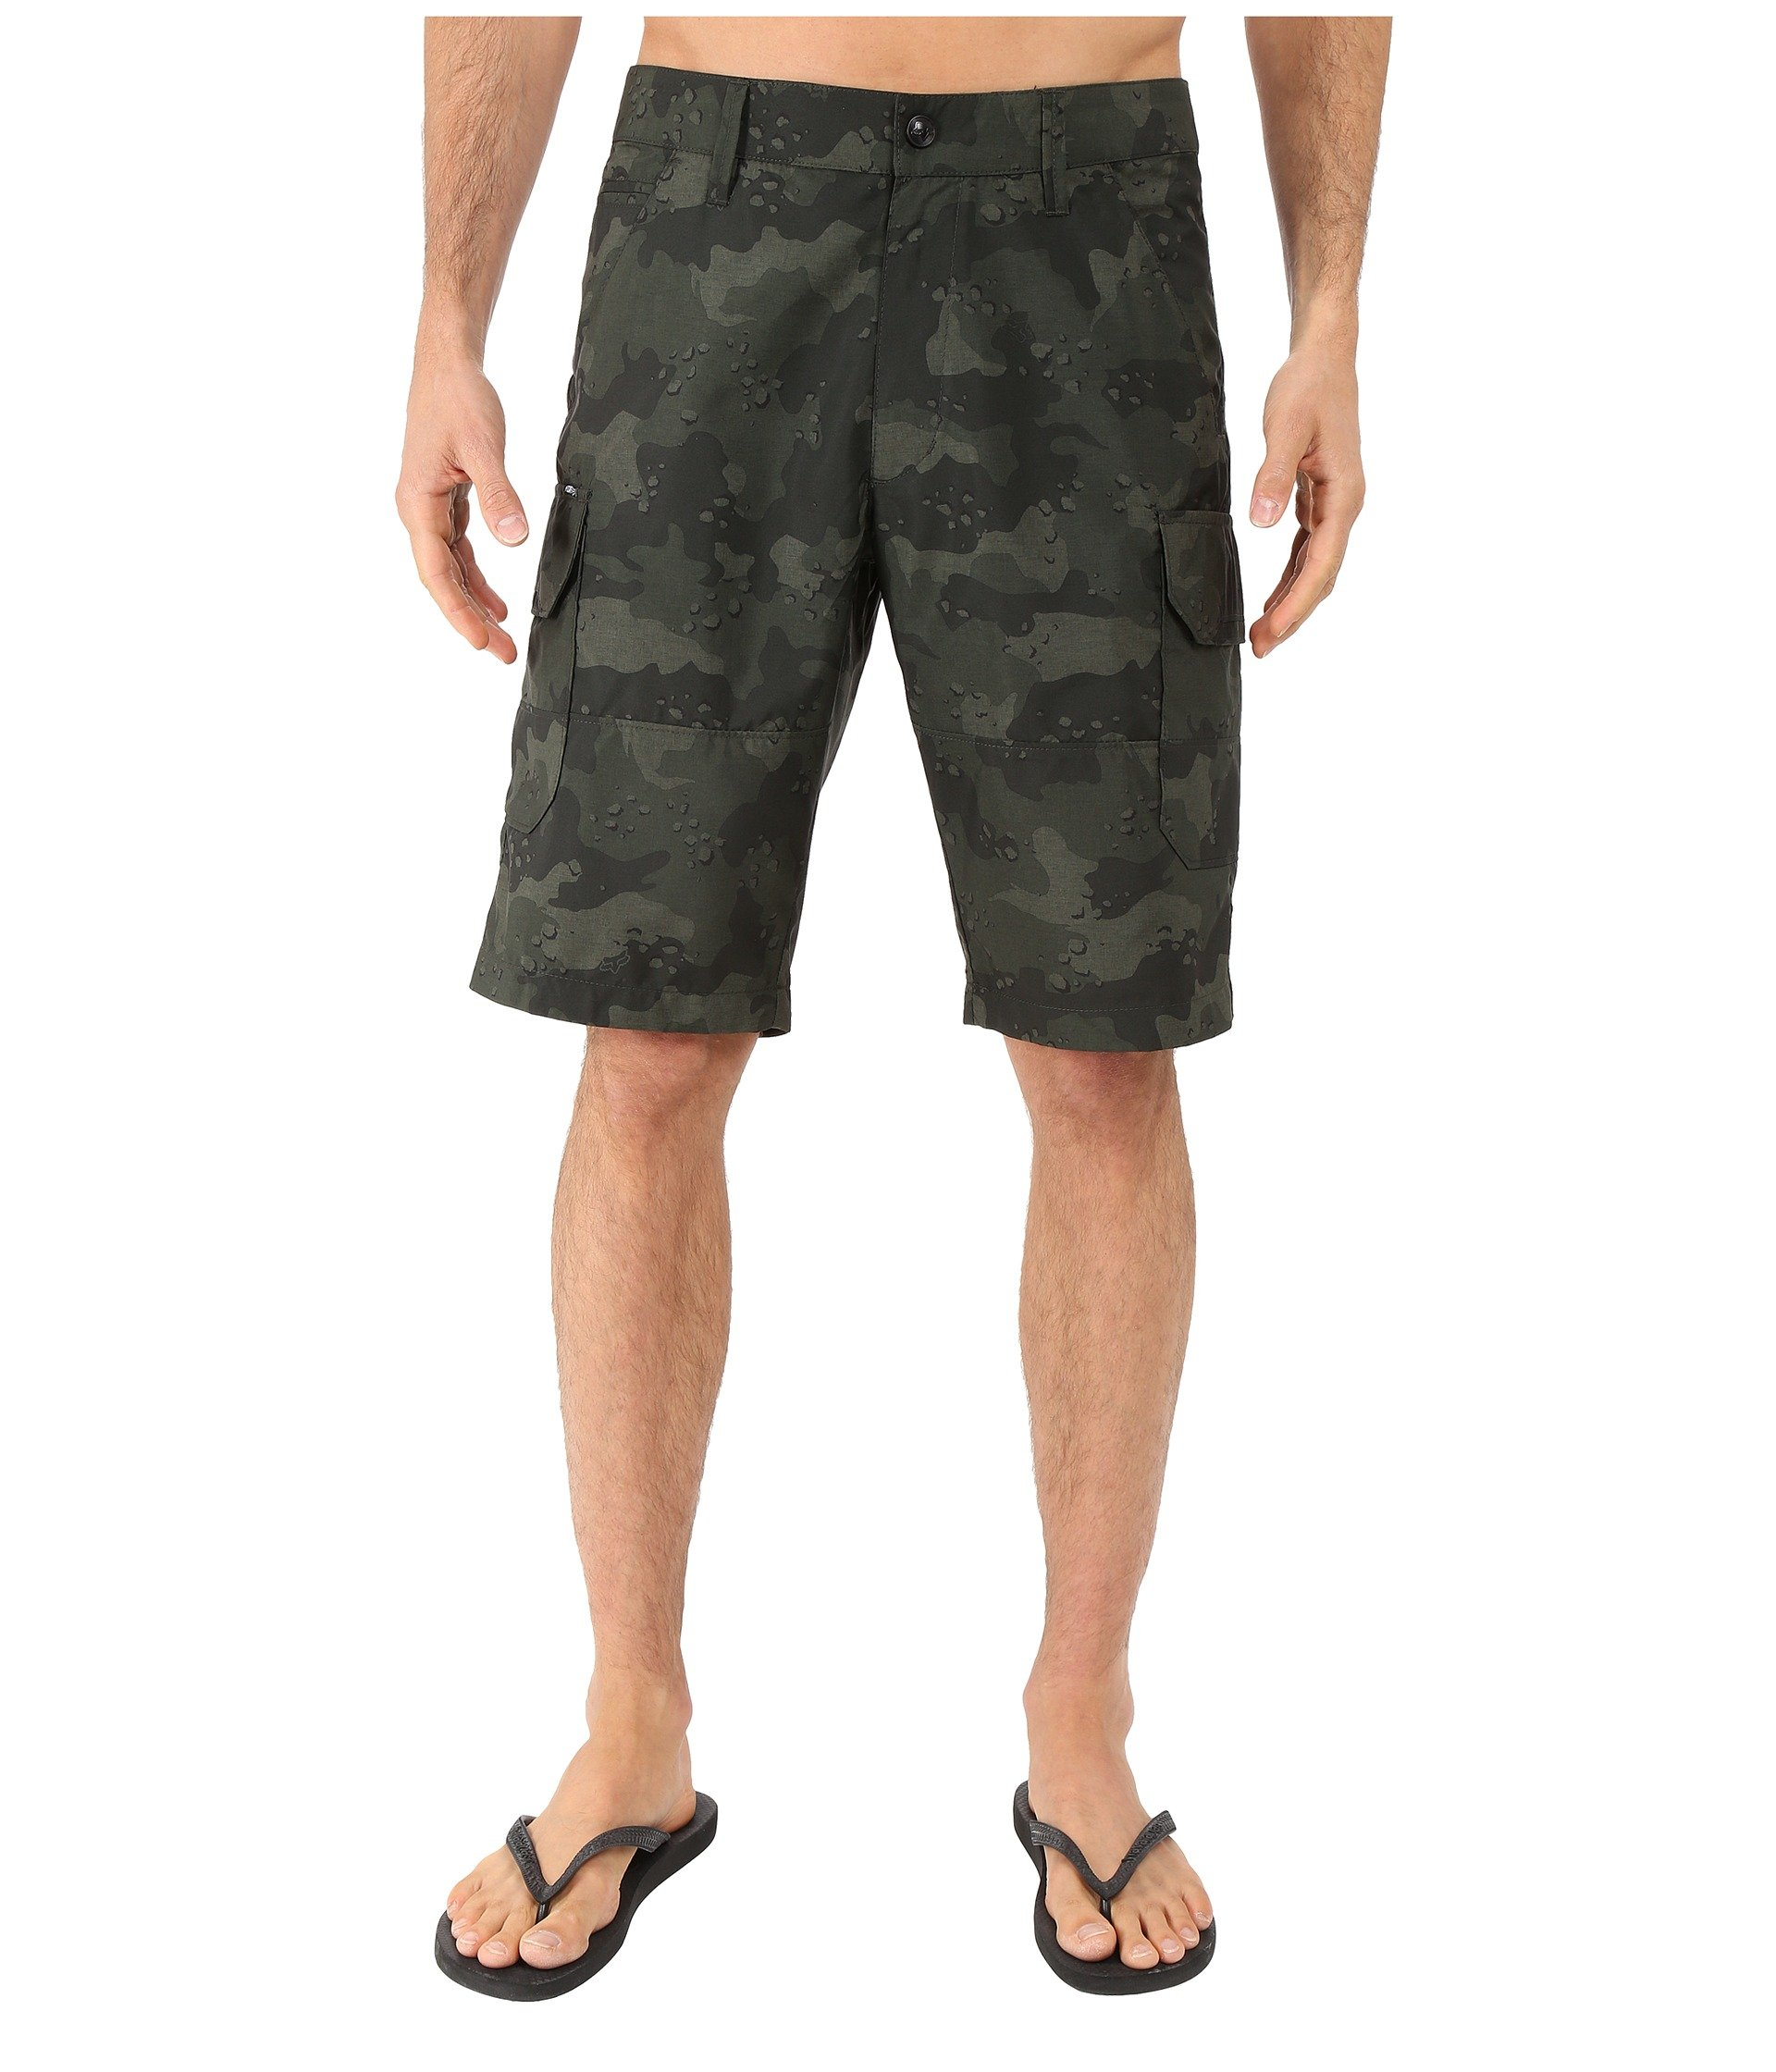 Pantaloneta para Hombre Fox Slambozo Tech Camo Shorts  + Fox en VeoyCompro.net